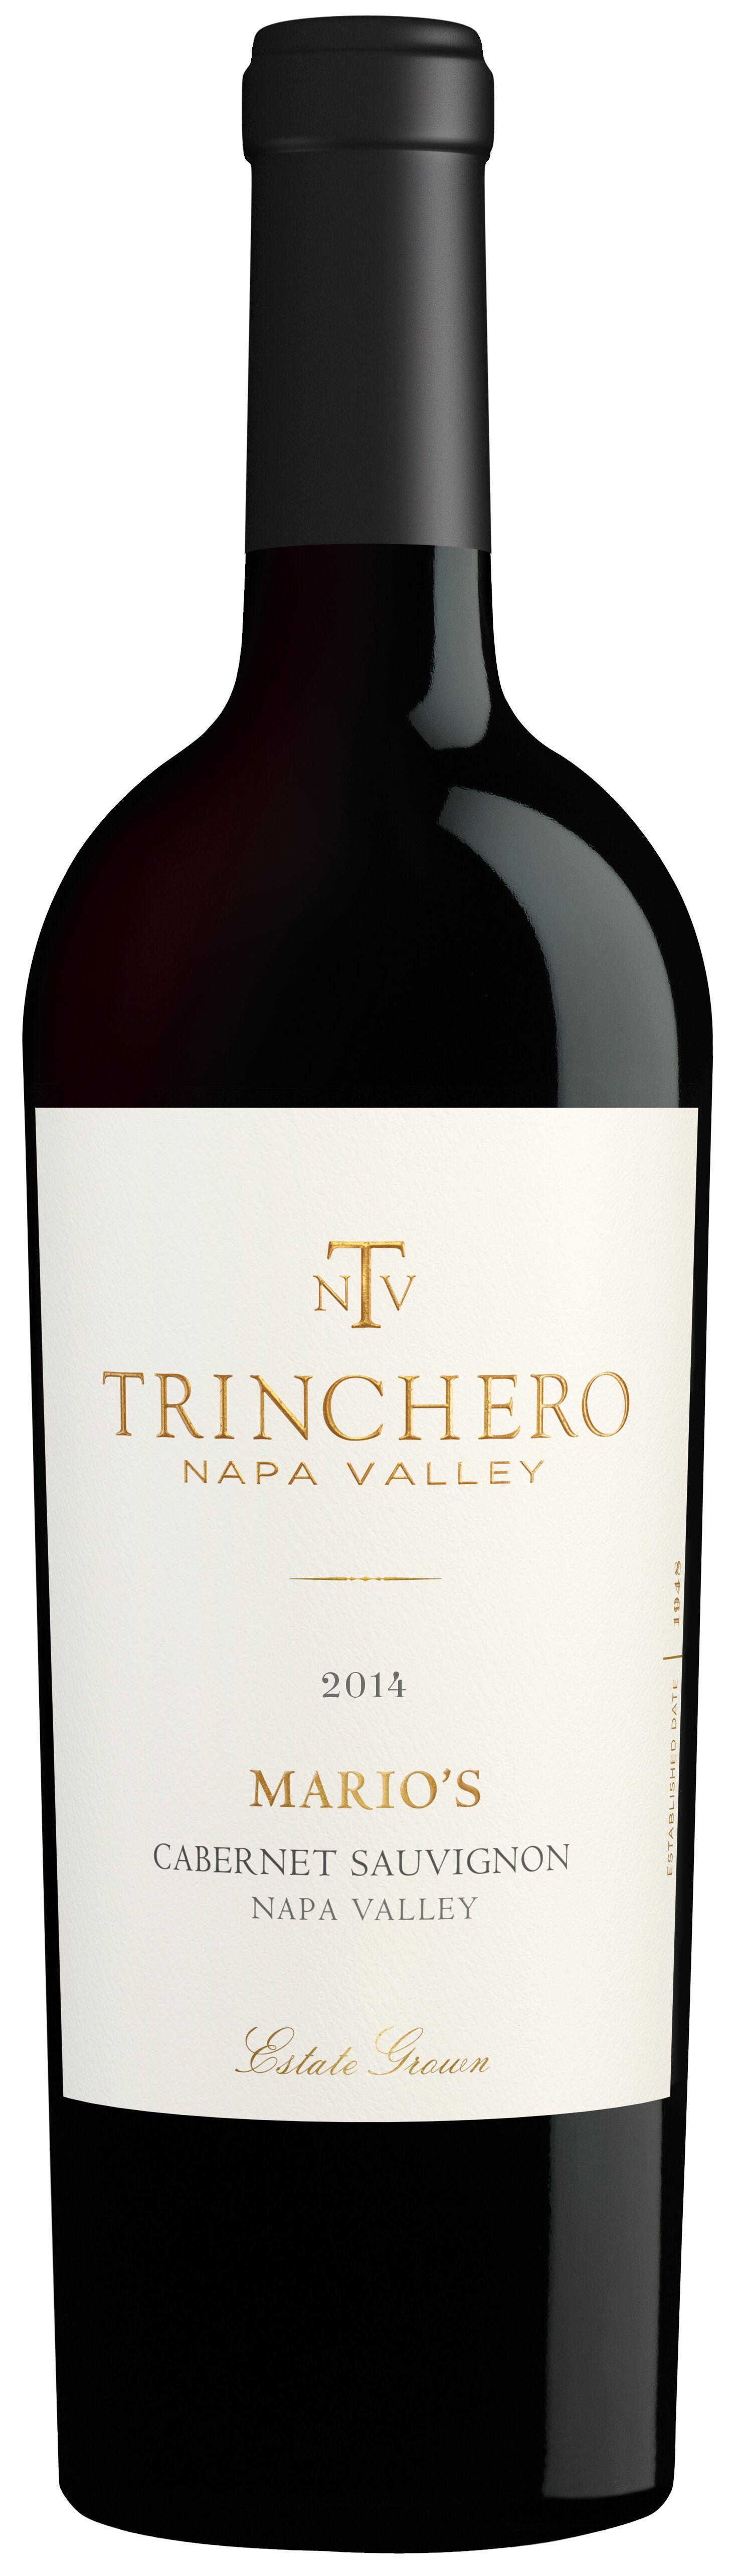 Trinchero Napa Valley 2014 Mario's Cabernet Sauvignon